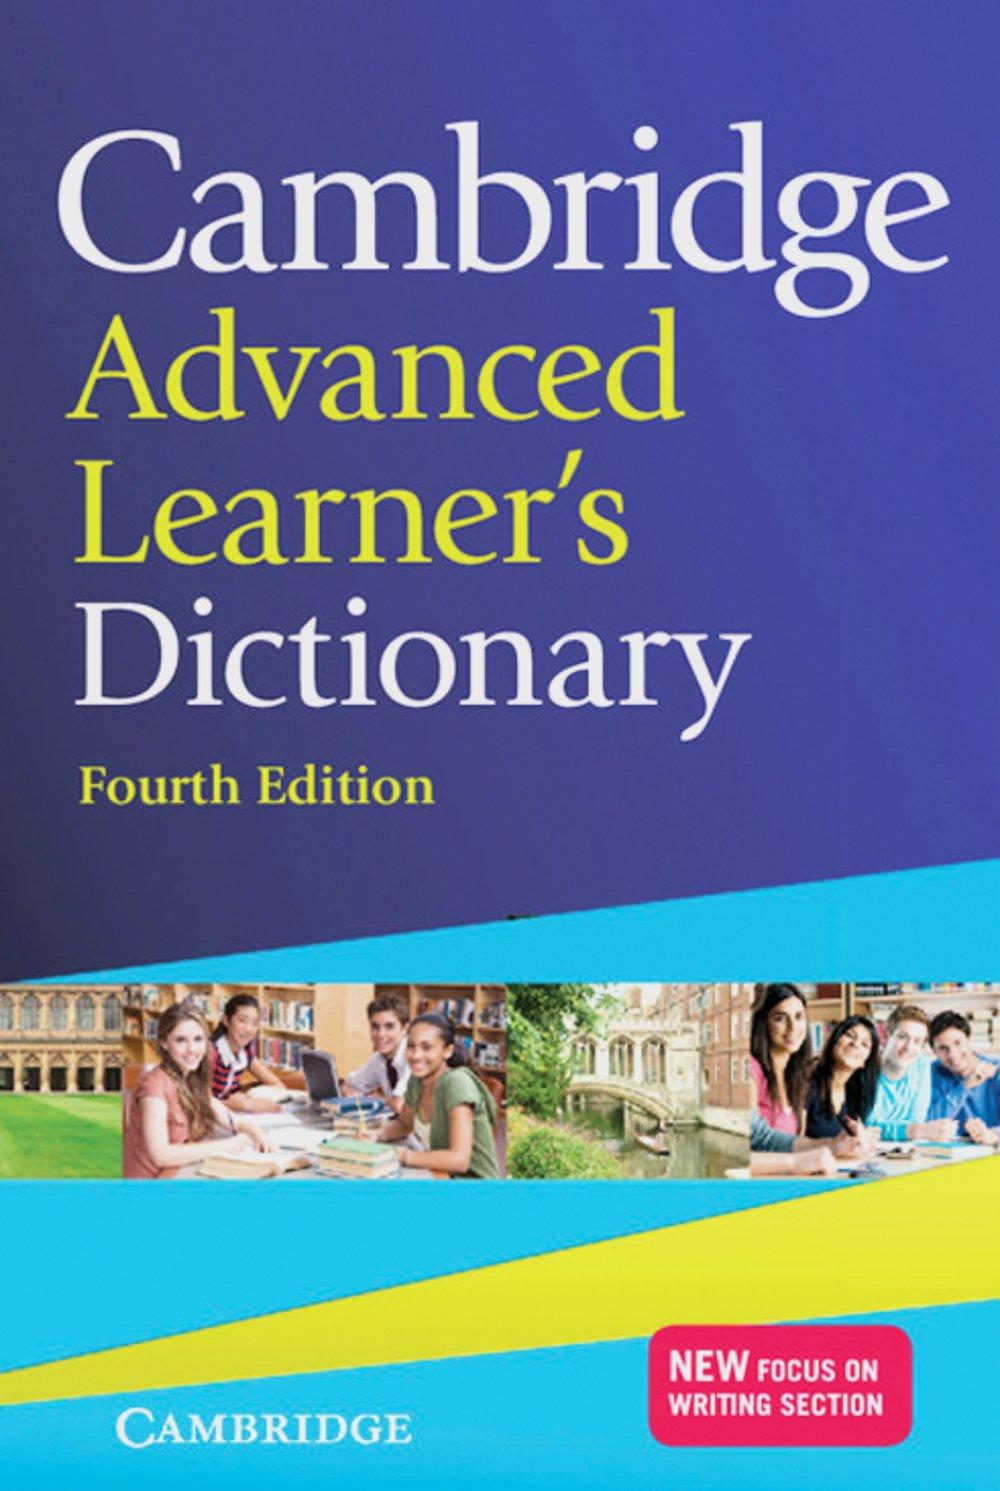 Cambridge Advanced Learner's Dictionary Fourth edition: Hardback Gebundenes Buch – 5. August 2013 Colin McLntosh Klett Sprachen 3125401534 Fremdsprachige Wörterbücher